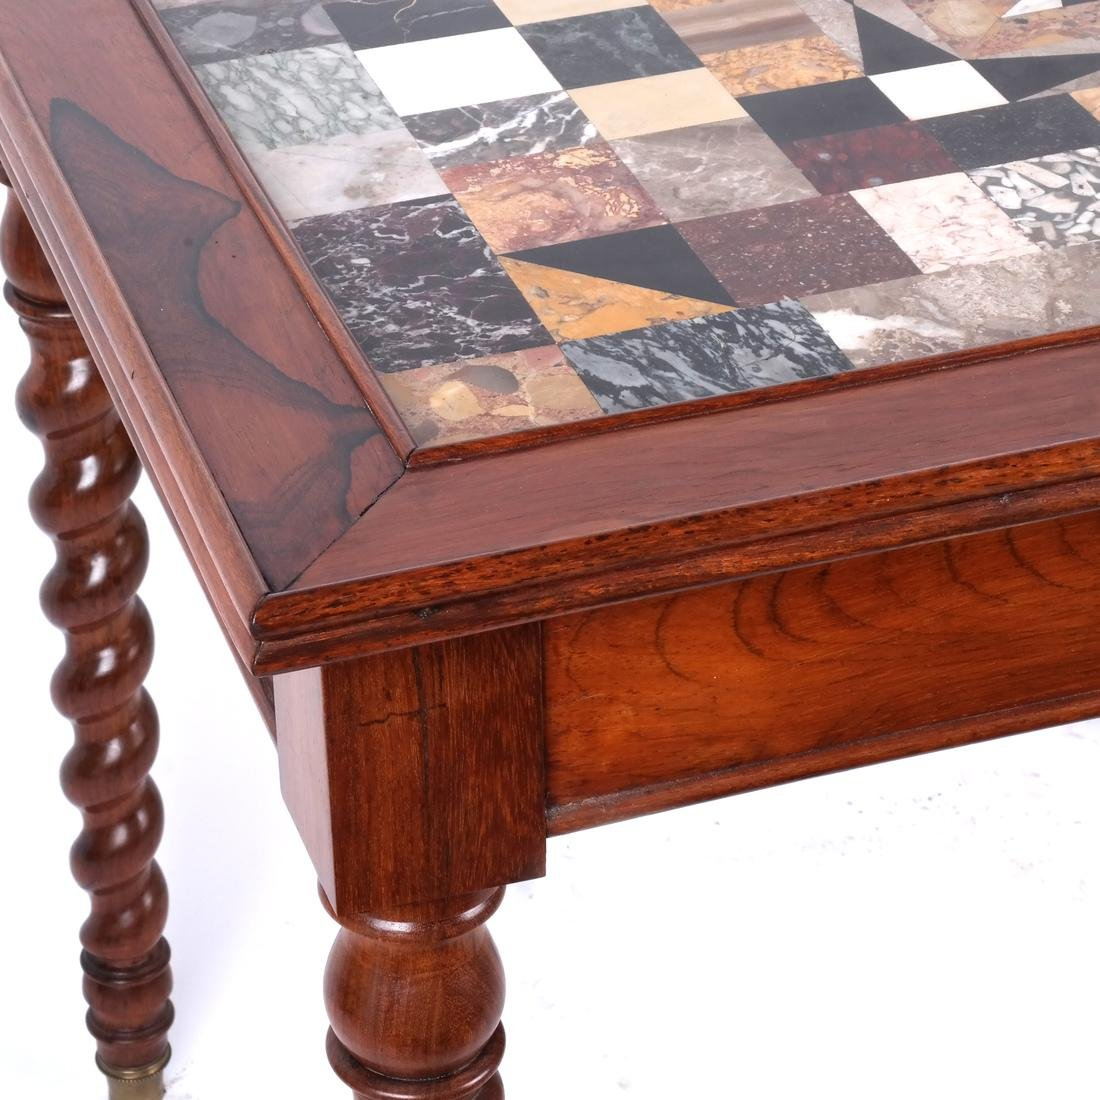 Antique Specimen Marble Top Table - 4